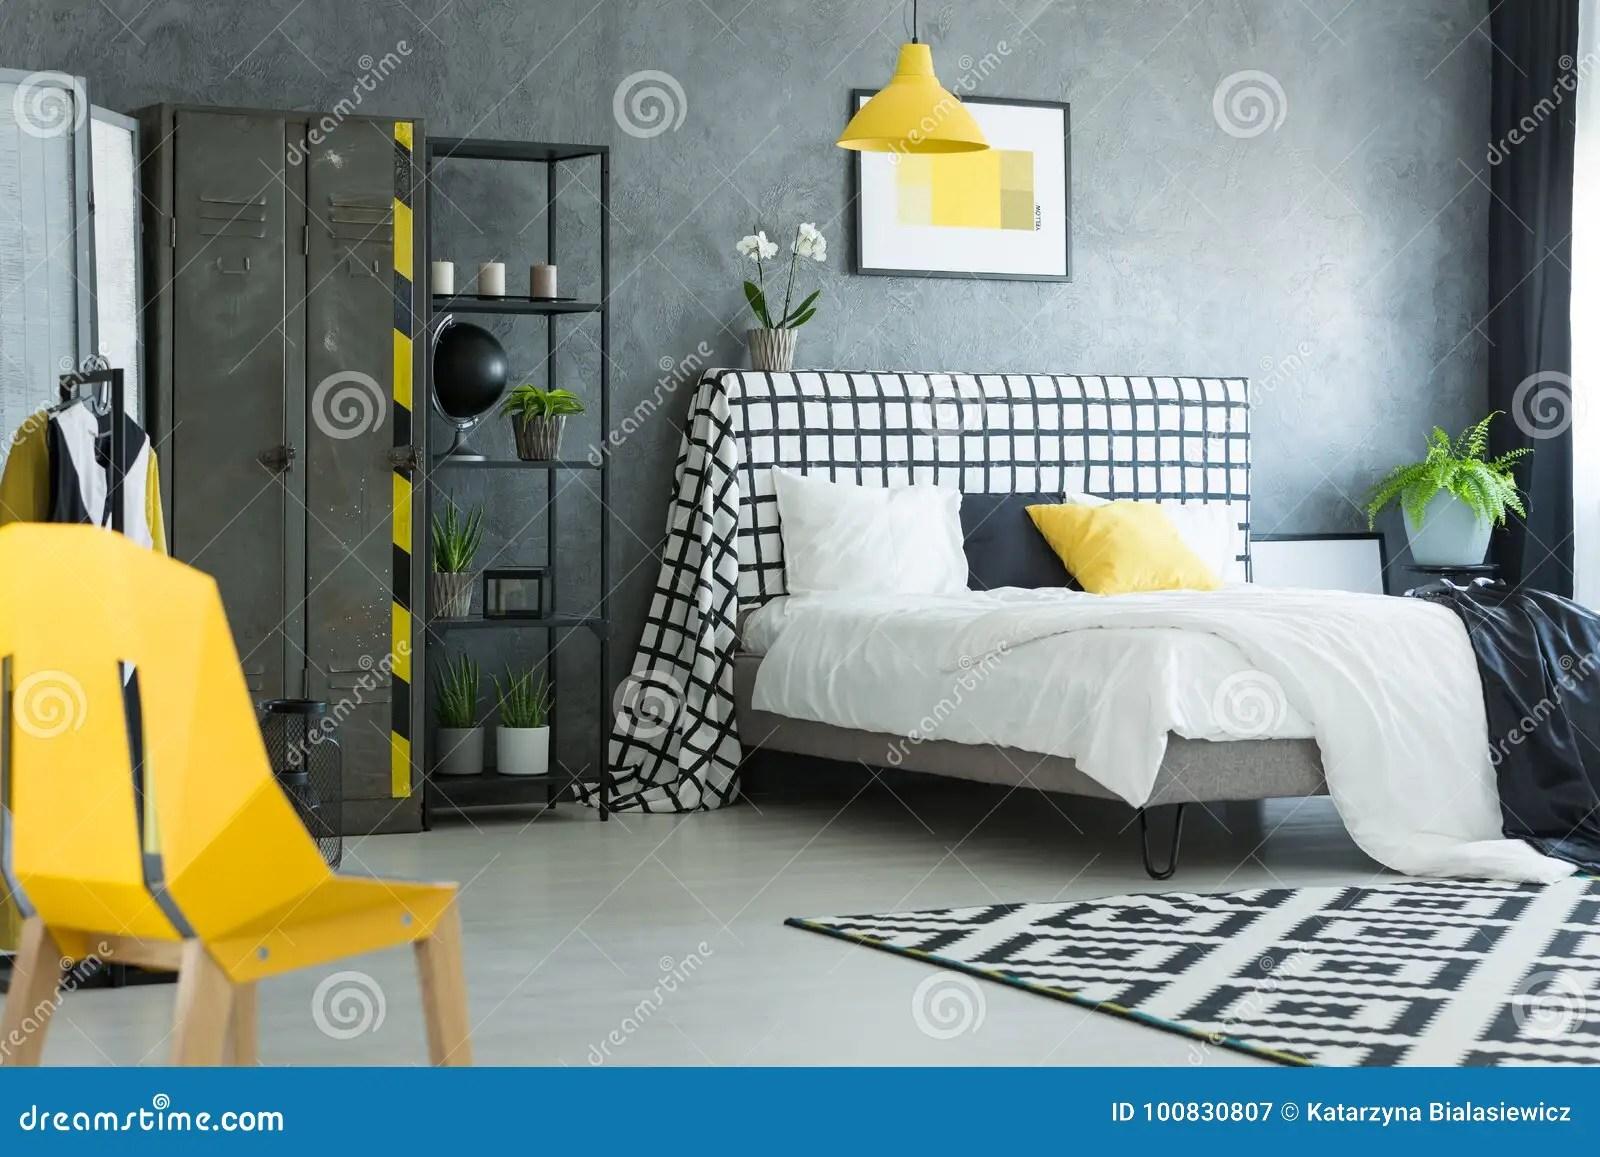 https www dreamstime com yellow designer chair bedroom yellow designer chair black white bedroom geometric carpet metal shelf image100830807